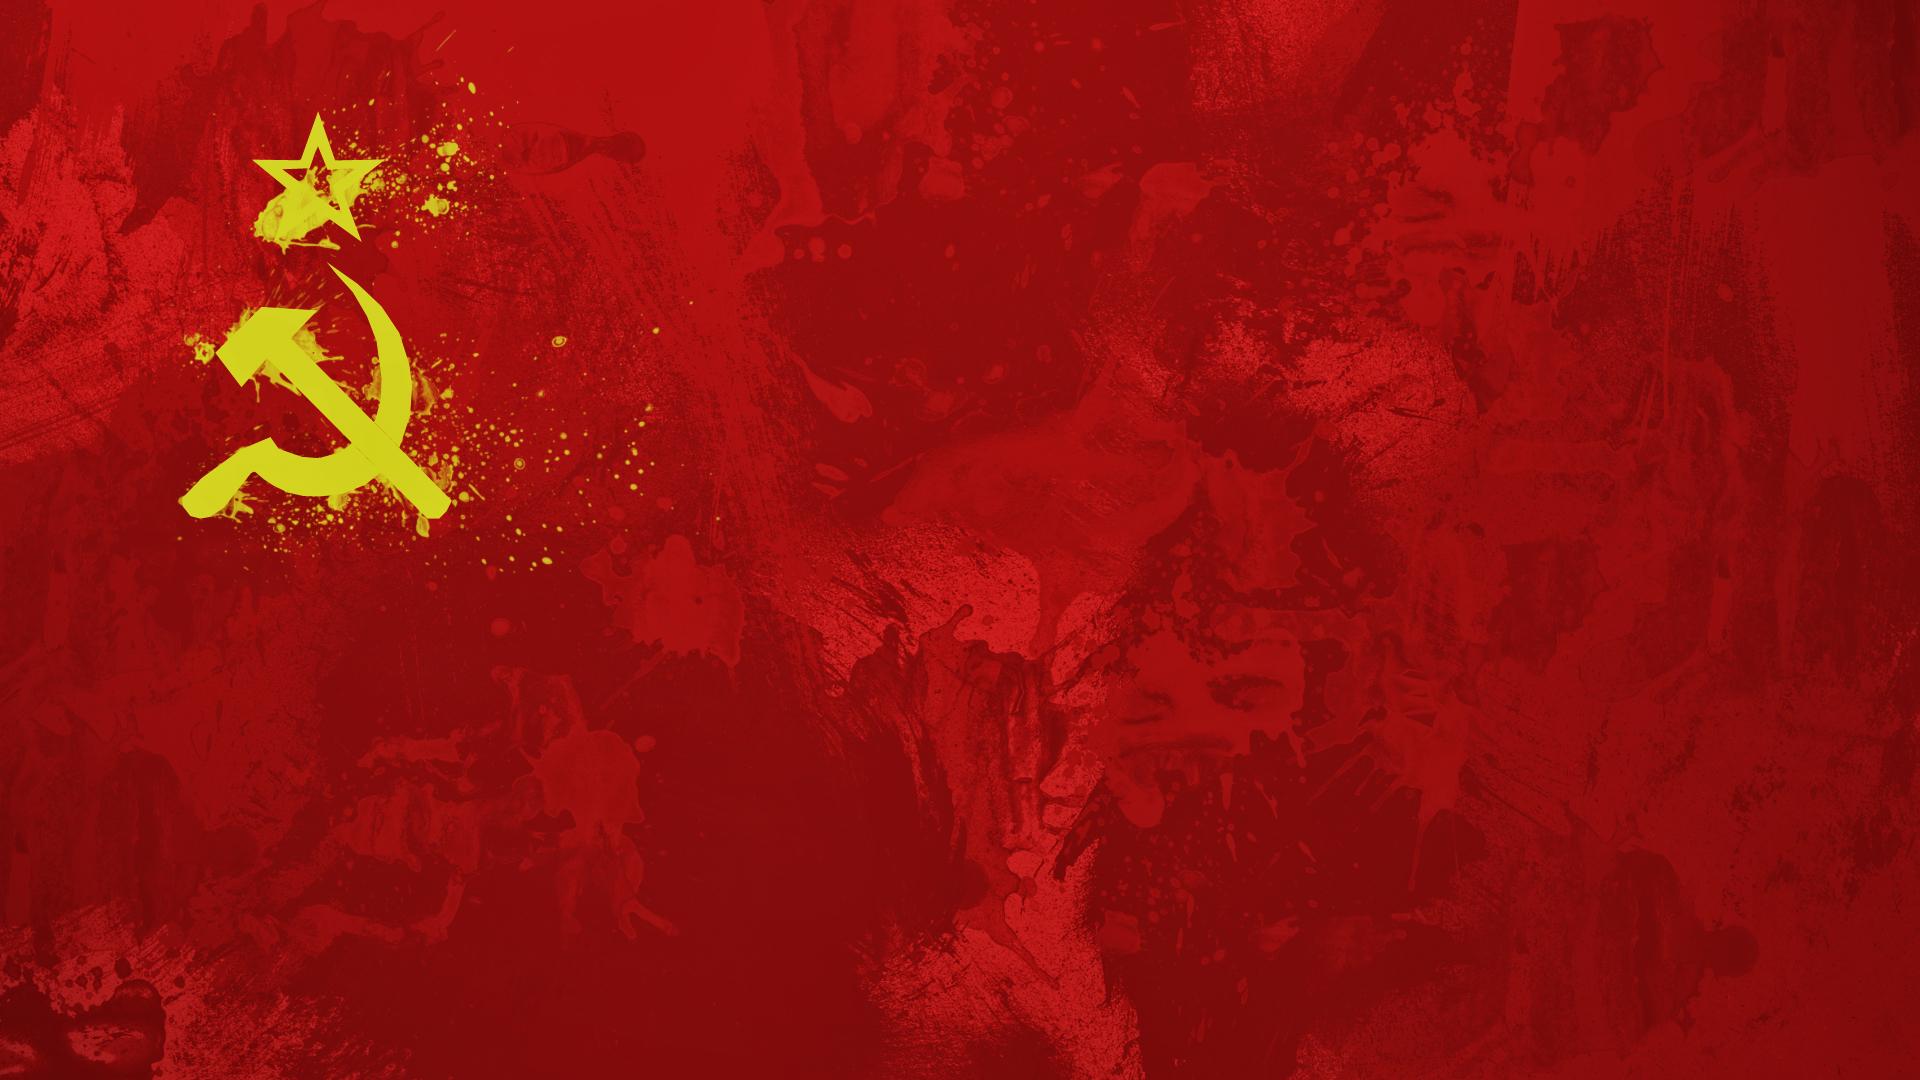 Пожеланиями, картинка советский флаг